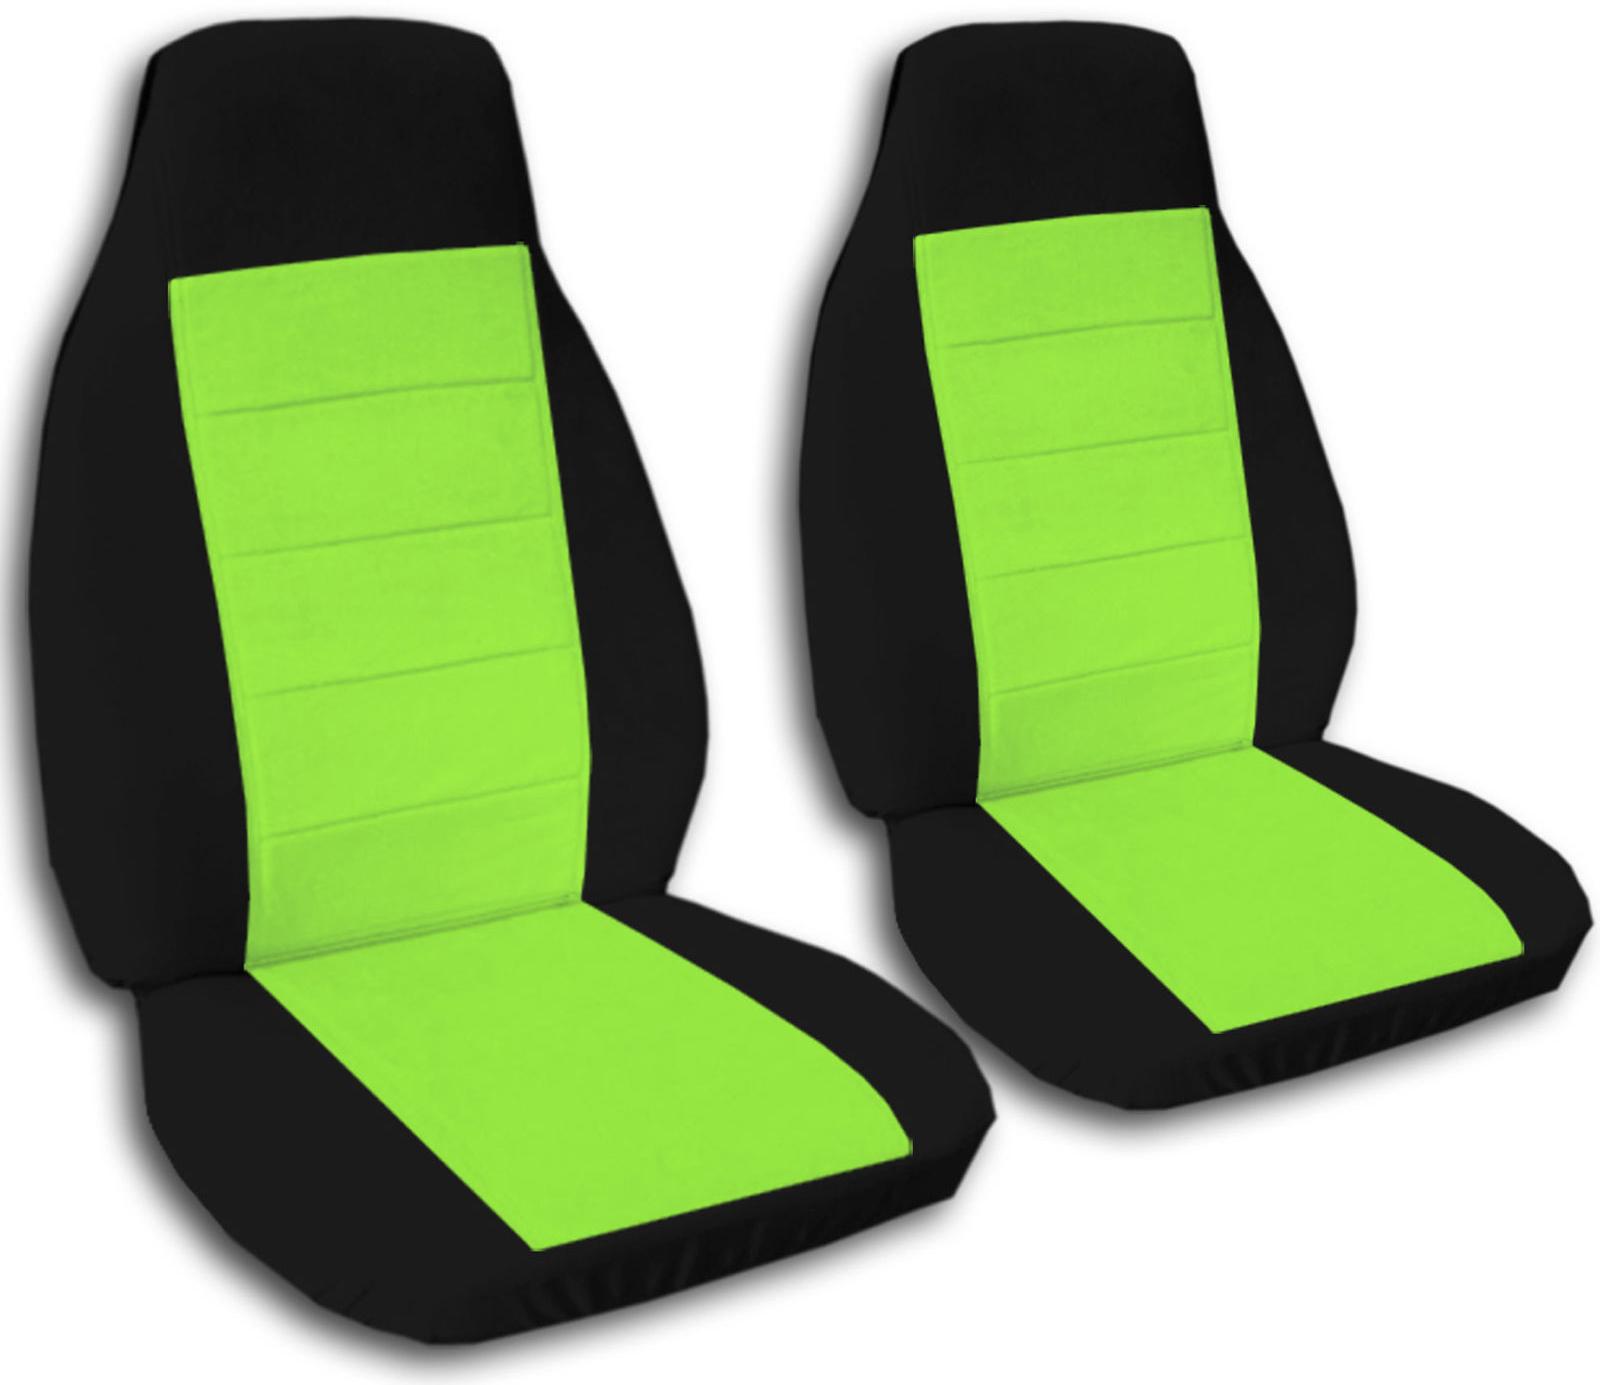 Red Camo Car Seat CoversAnimal Print Car Seat Covers